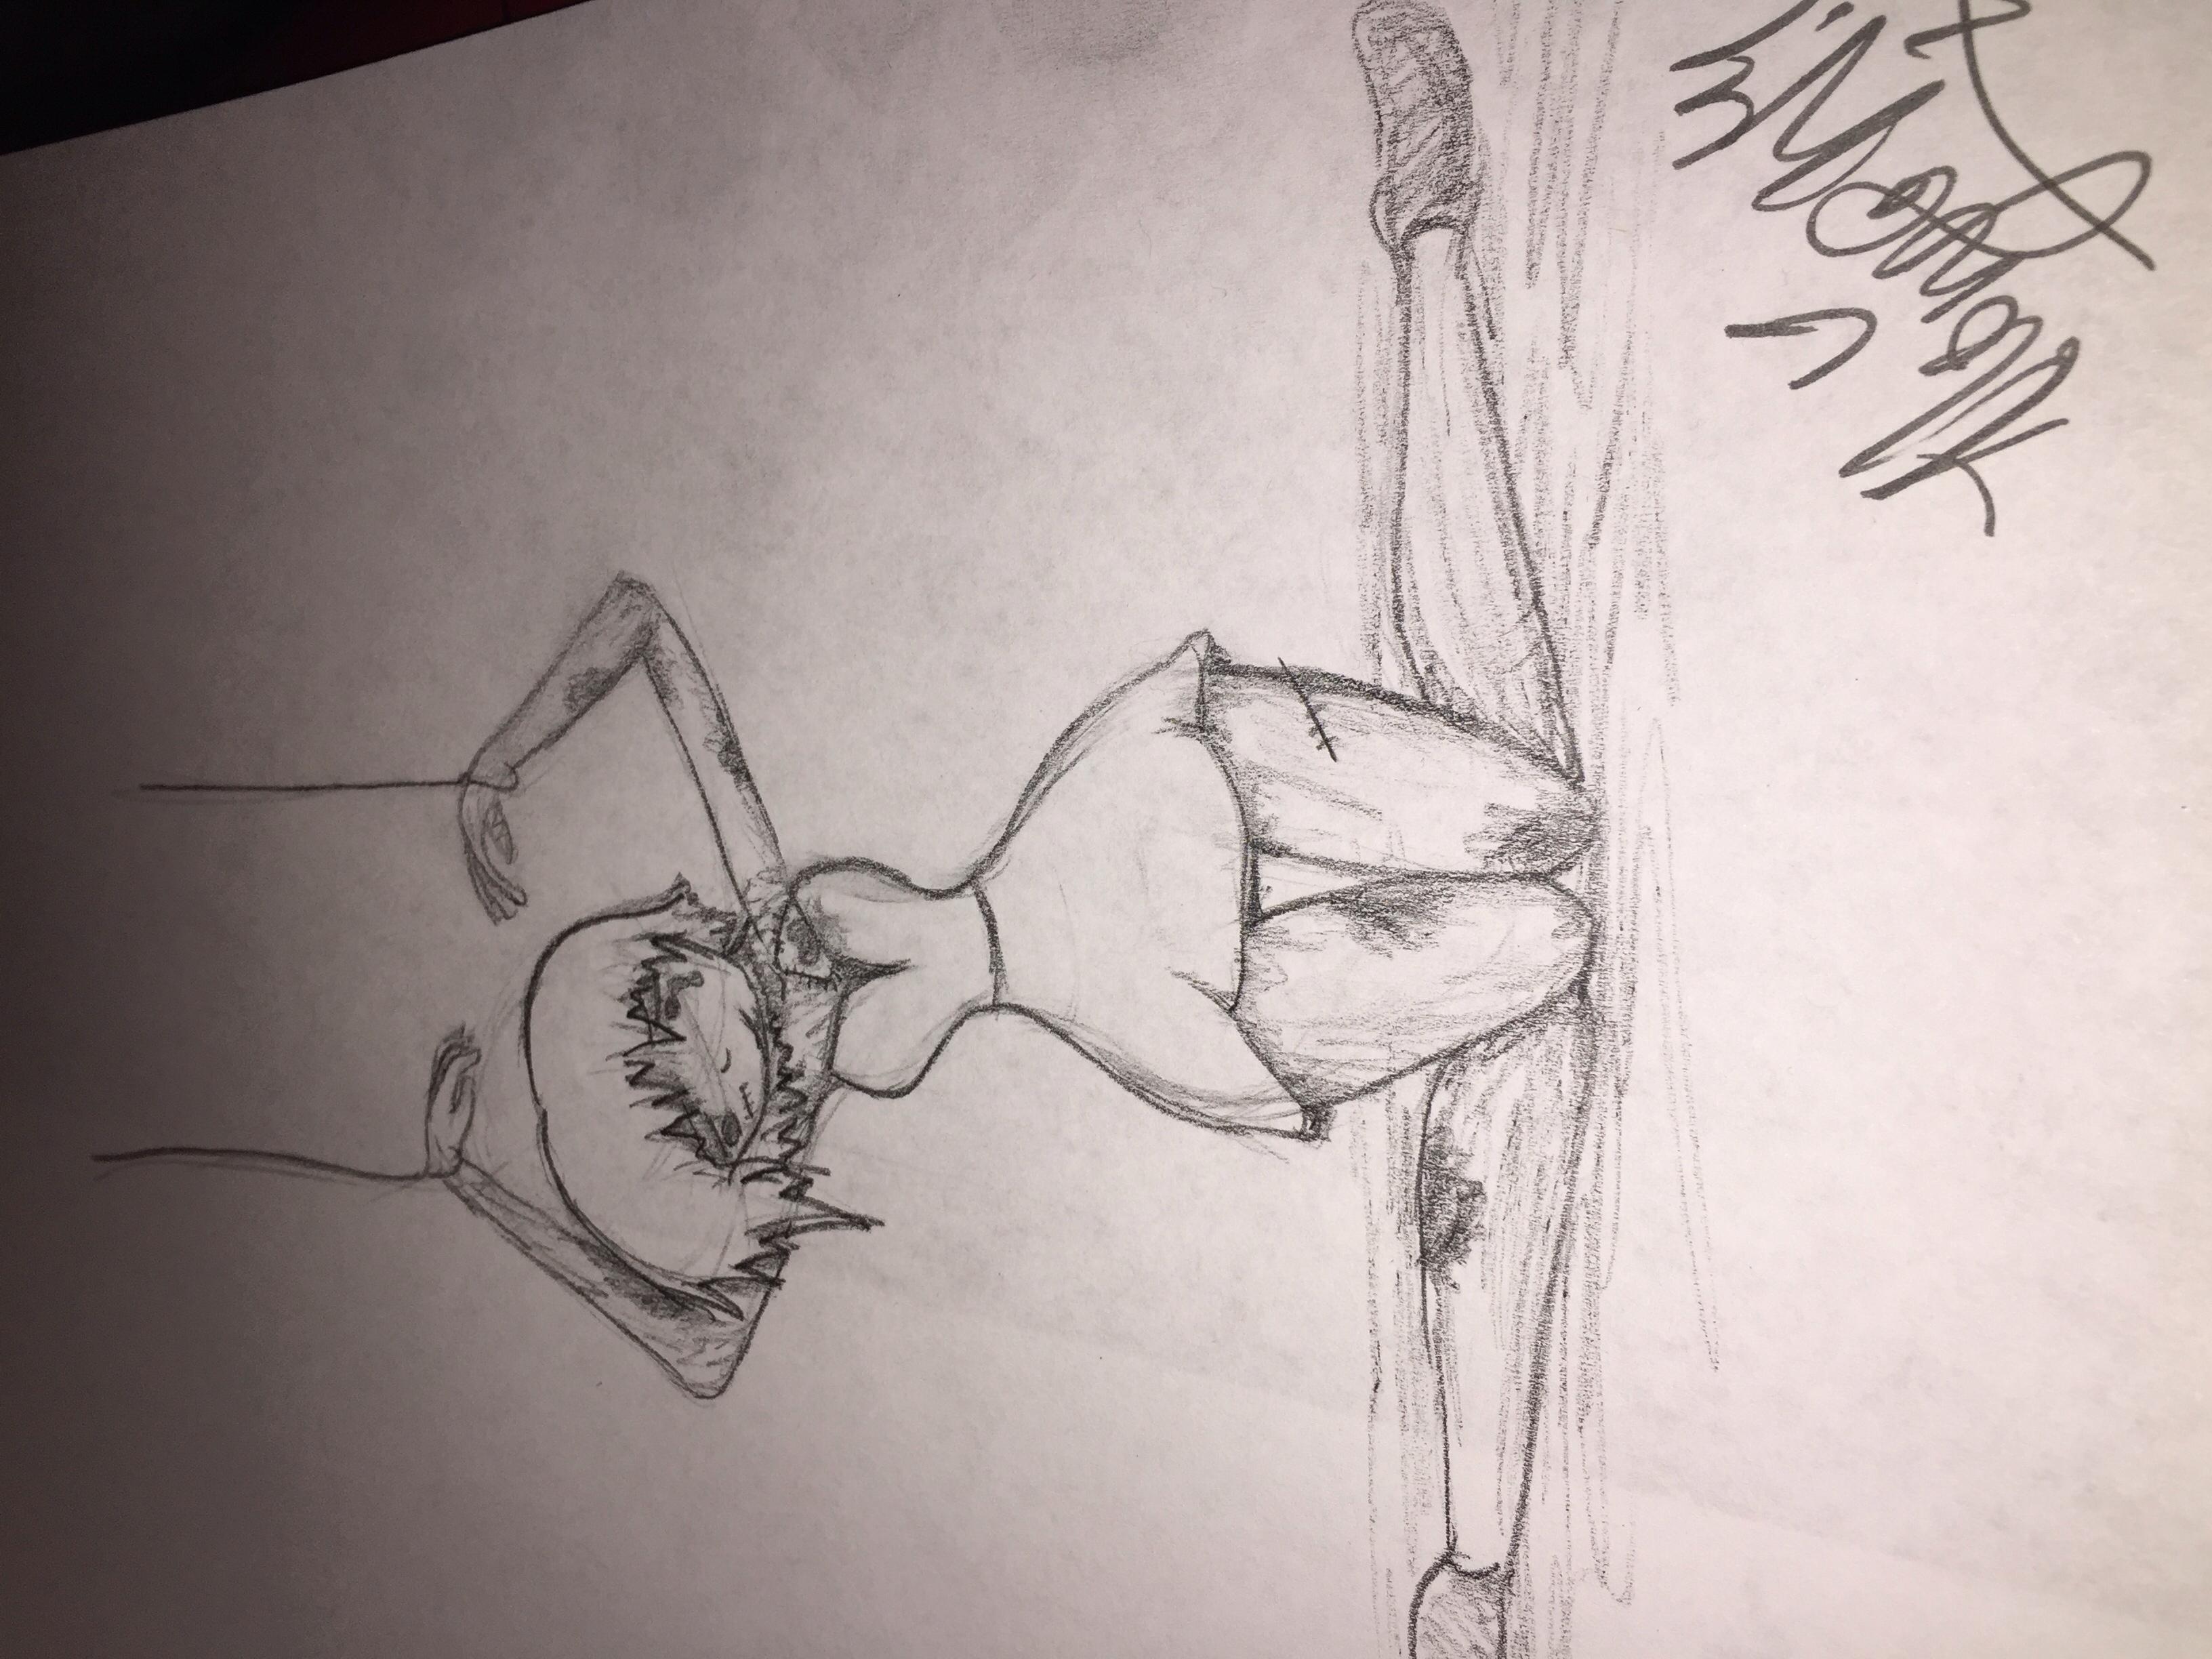 Drawn broken heart depression #2